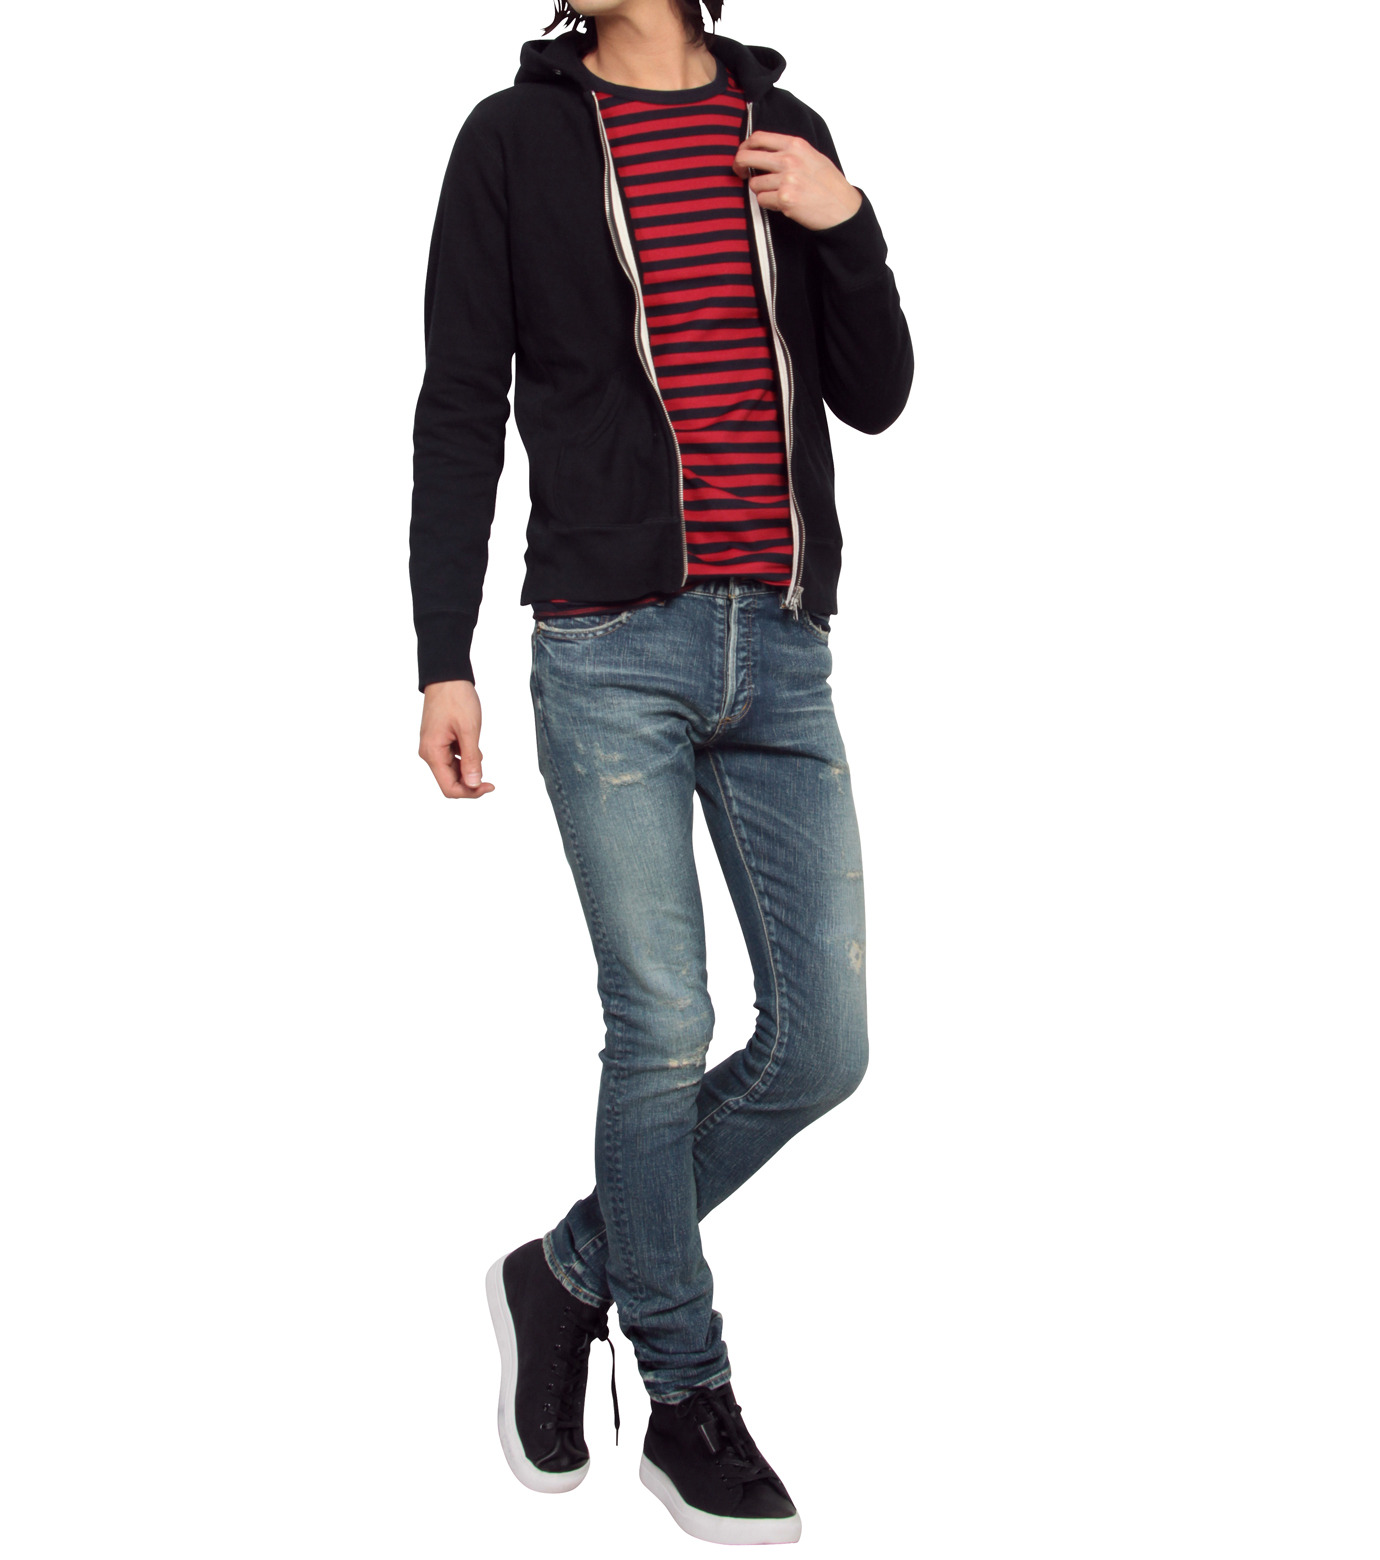 HL HEDDIE LOVU(エイチエル・エディールーヴ)のHL skinDamage-BLUE(パンツ/pants)-HL-skinDamag-92 拡大詳細画像3